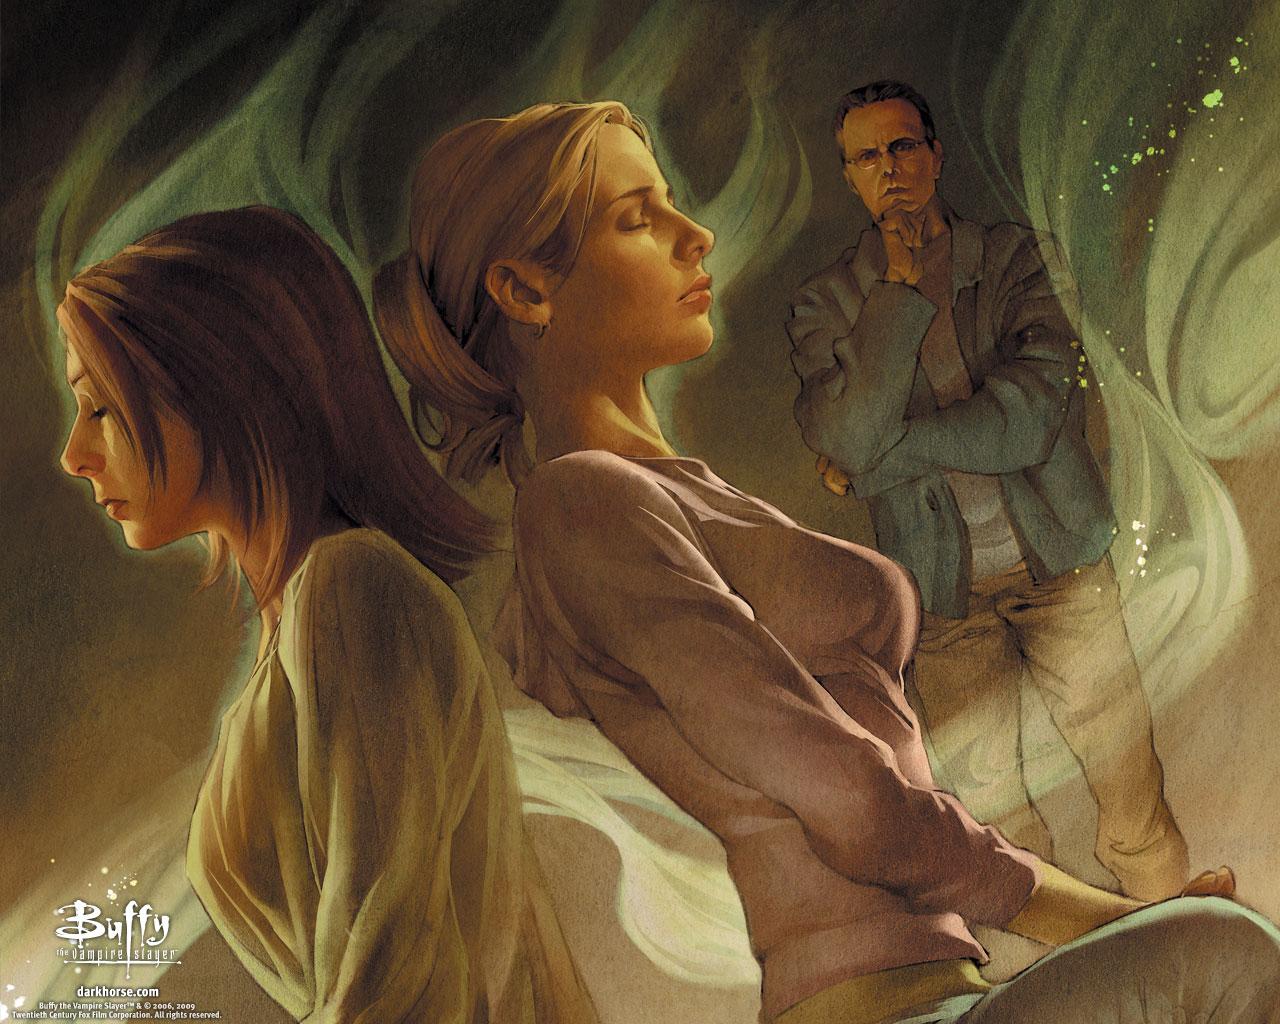 Buffy the Vampire Slayer :: Desktops :: Dark Horse Comics